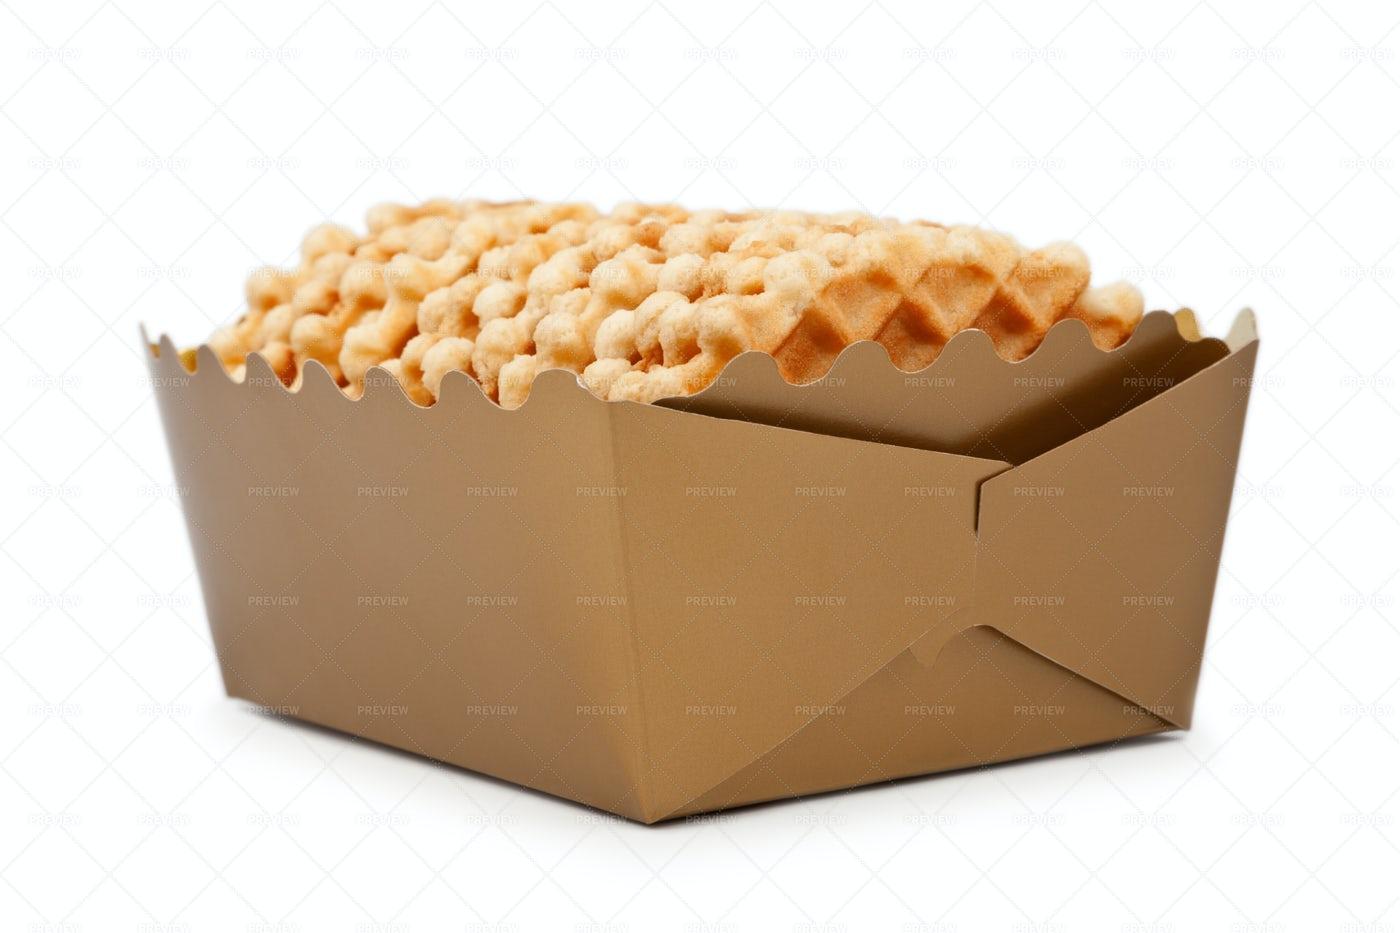 Box Of Waffles: Stock Photos